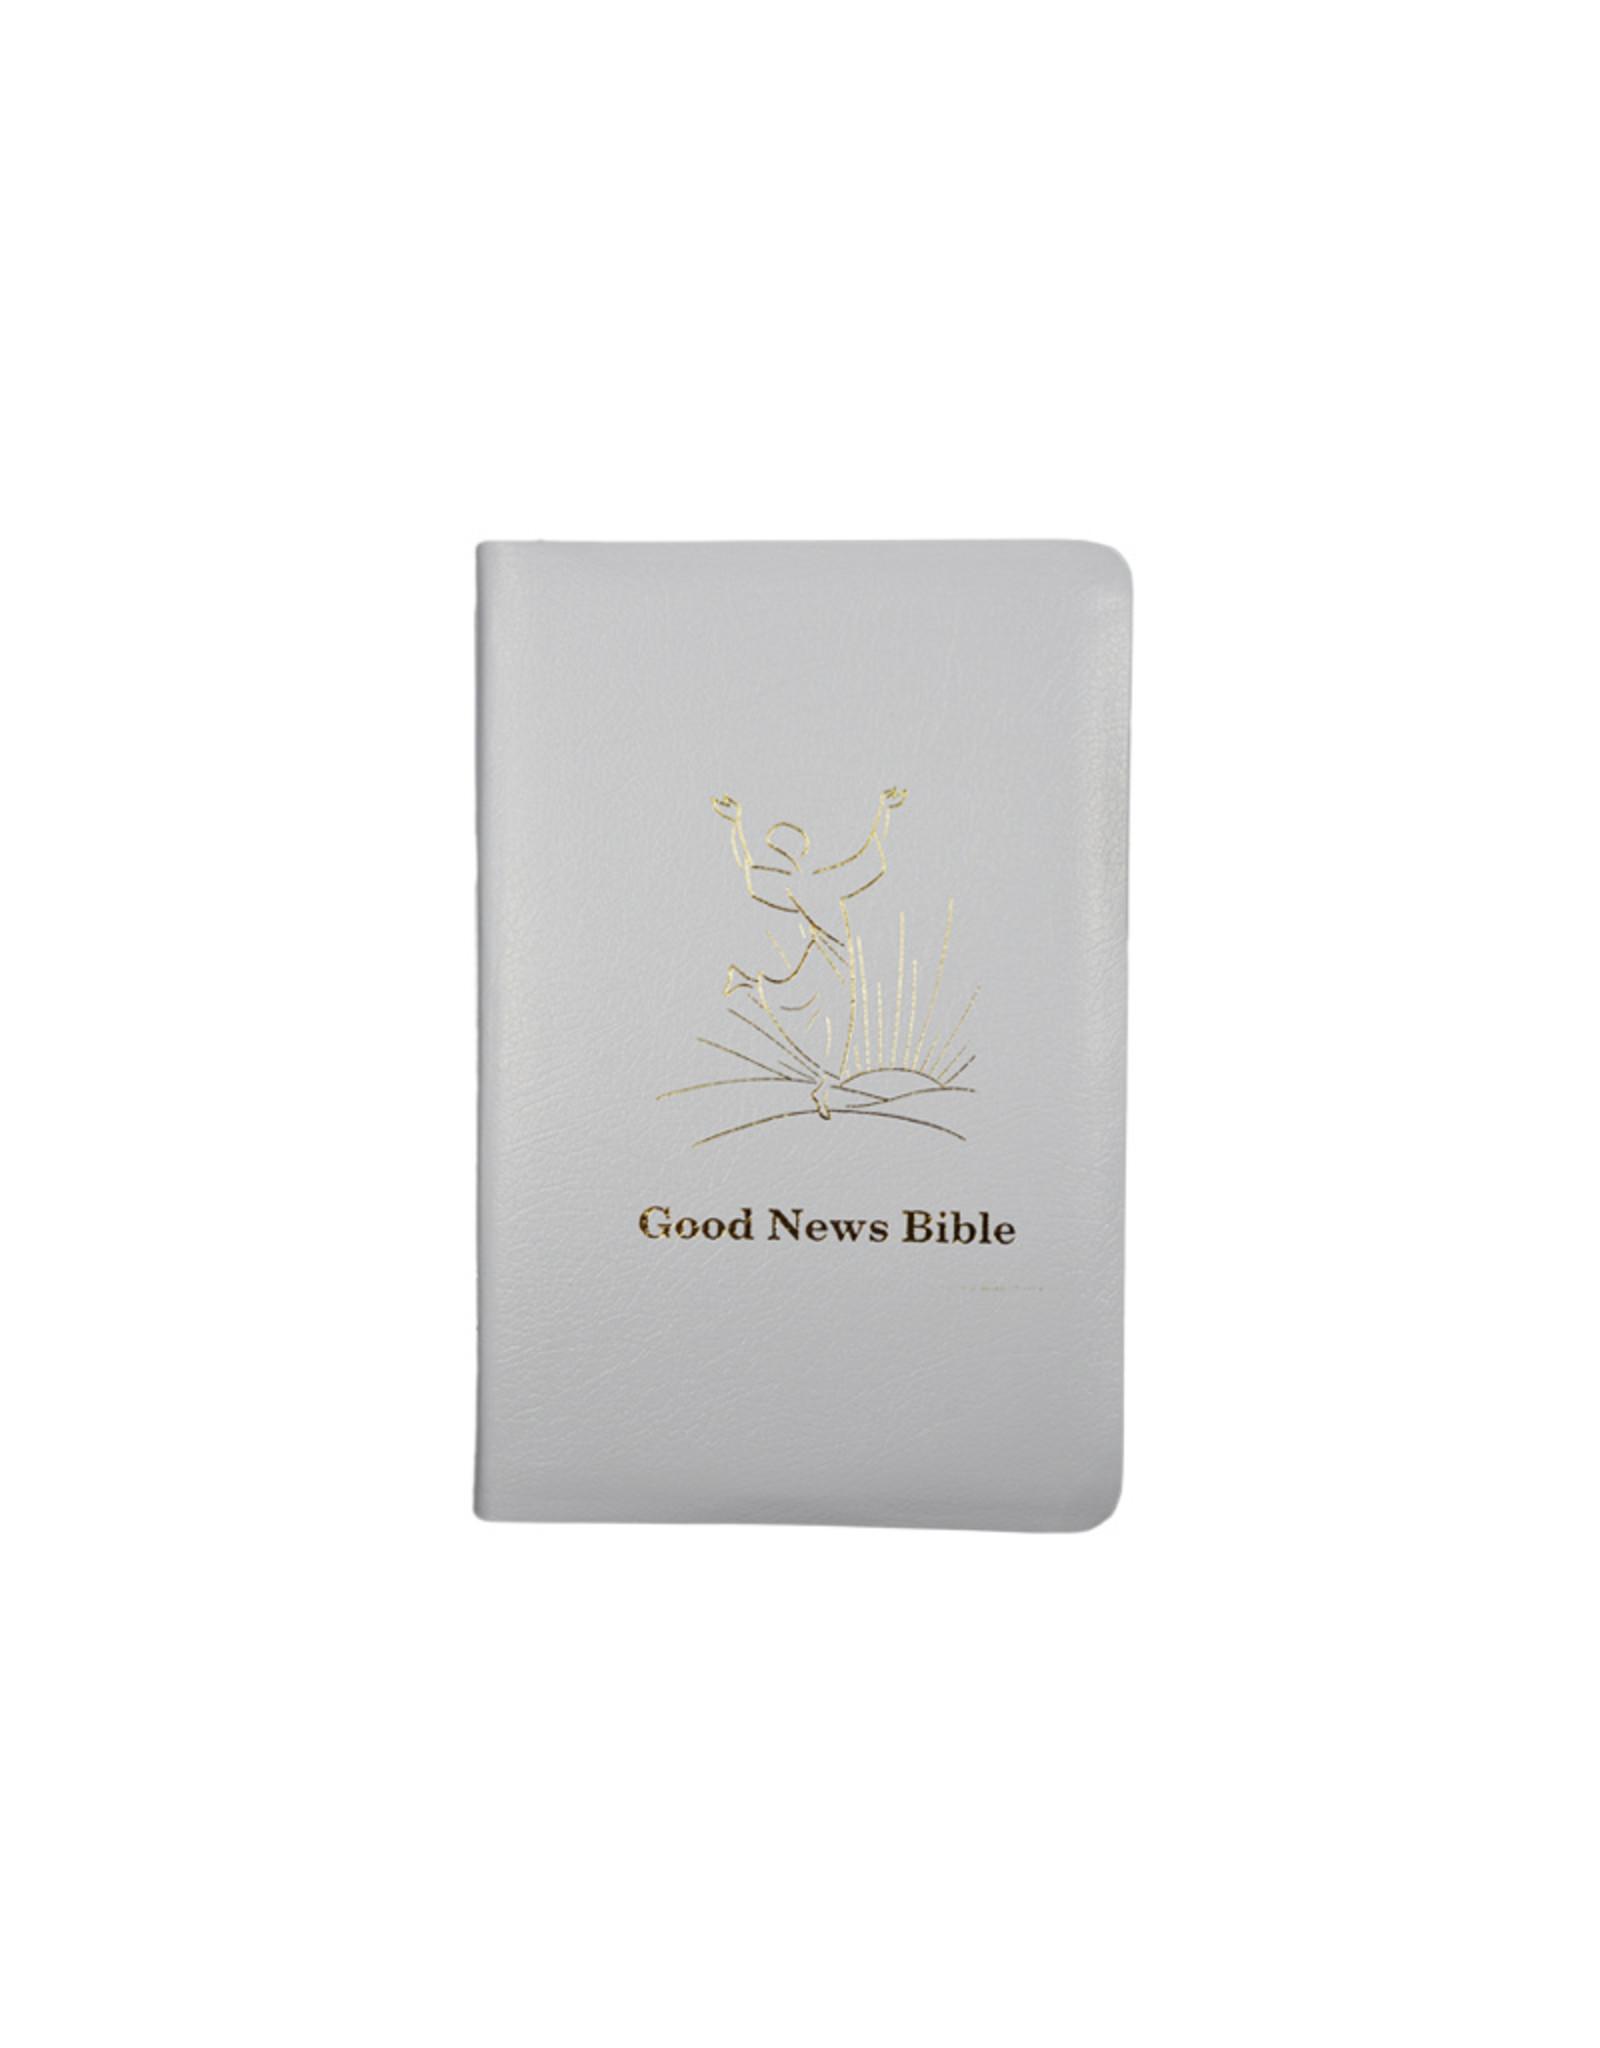 Société Biblique / Bible Society Good News Bible, White leather binding and gilt edged